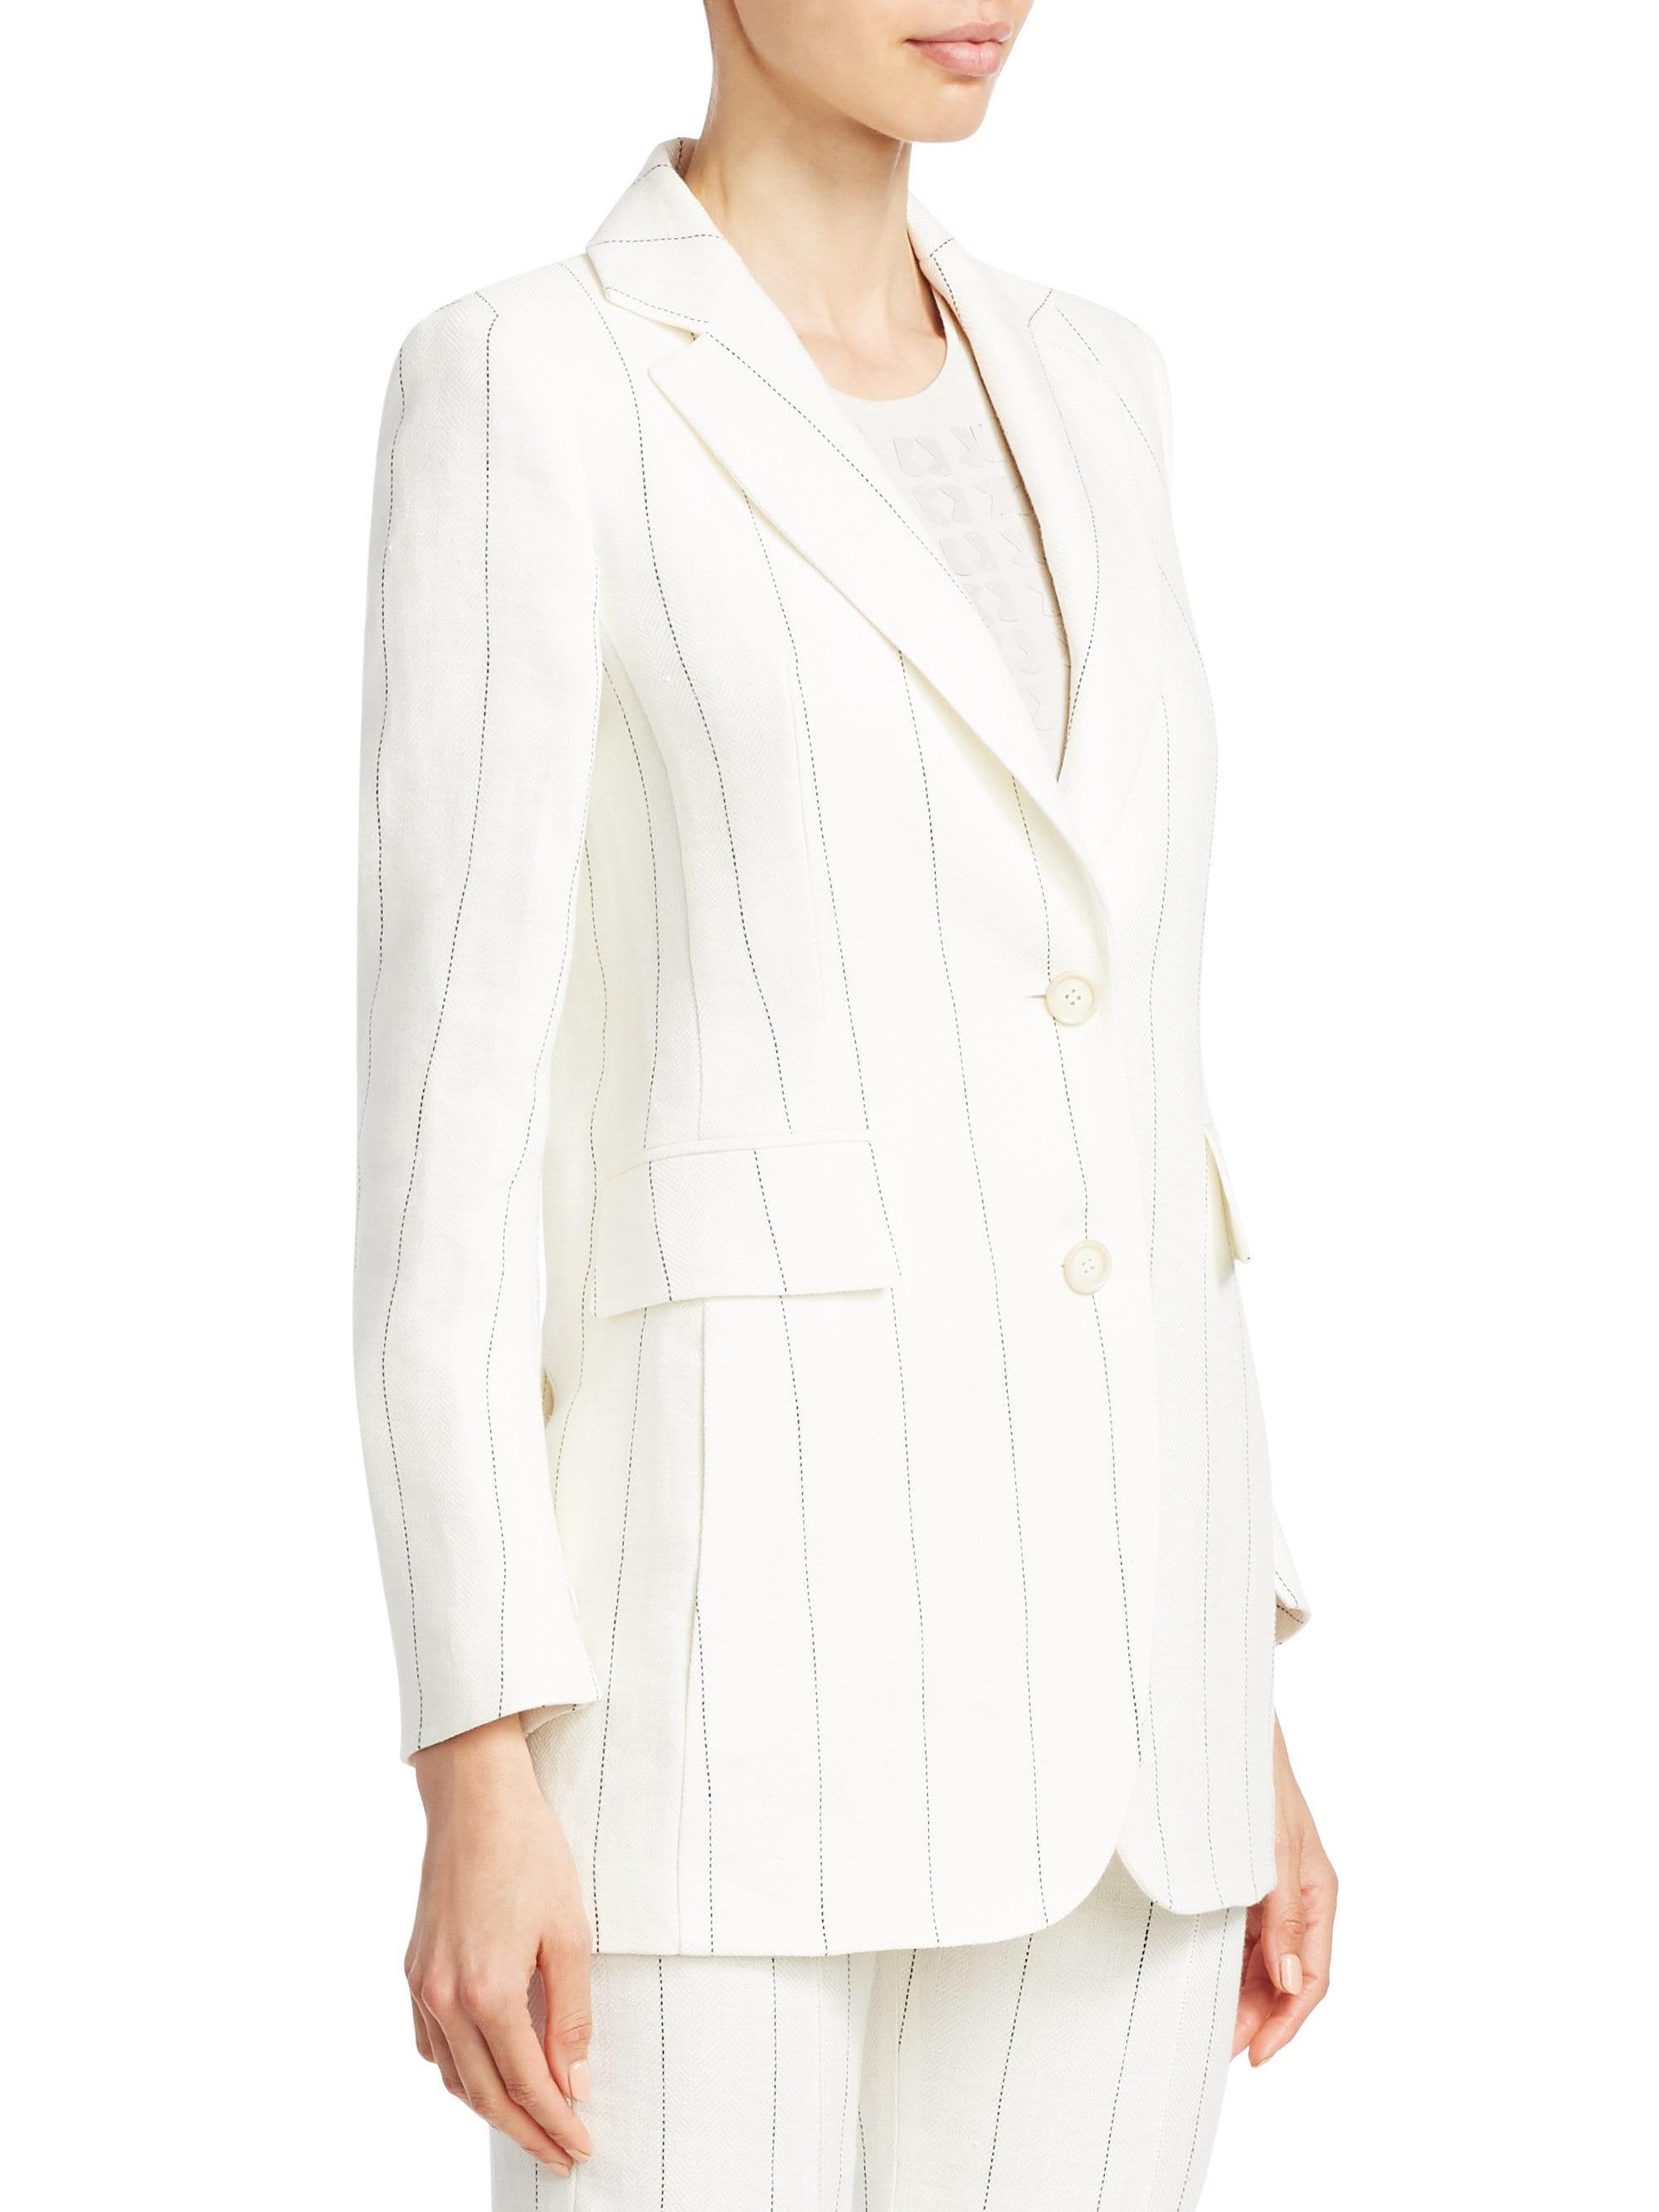 772c1b7e75 Lyst - Akris Women s Abiqui Linen Pinstripe Jacket - Paper in White